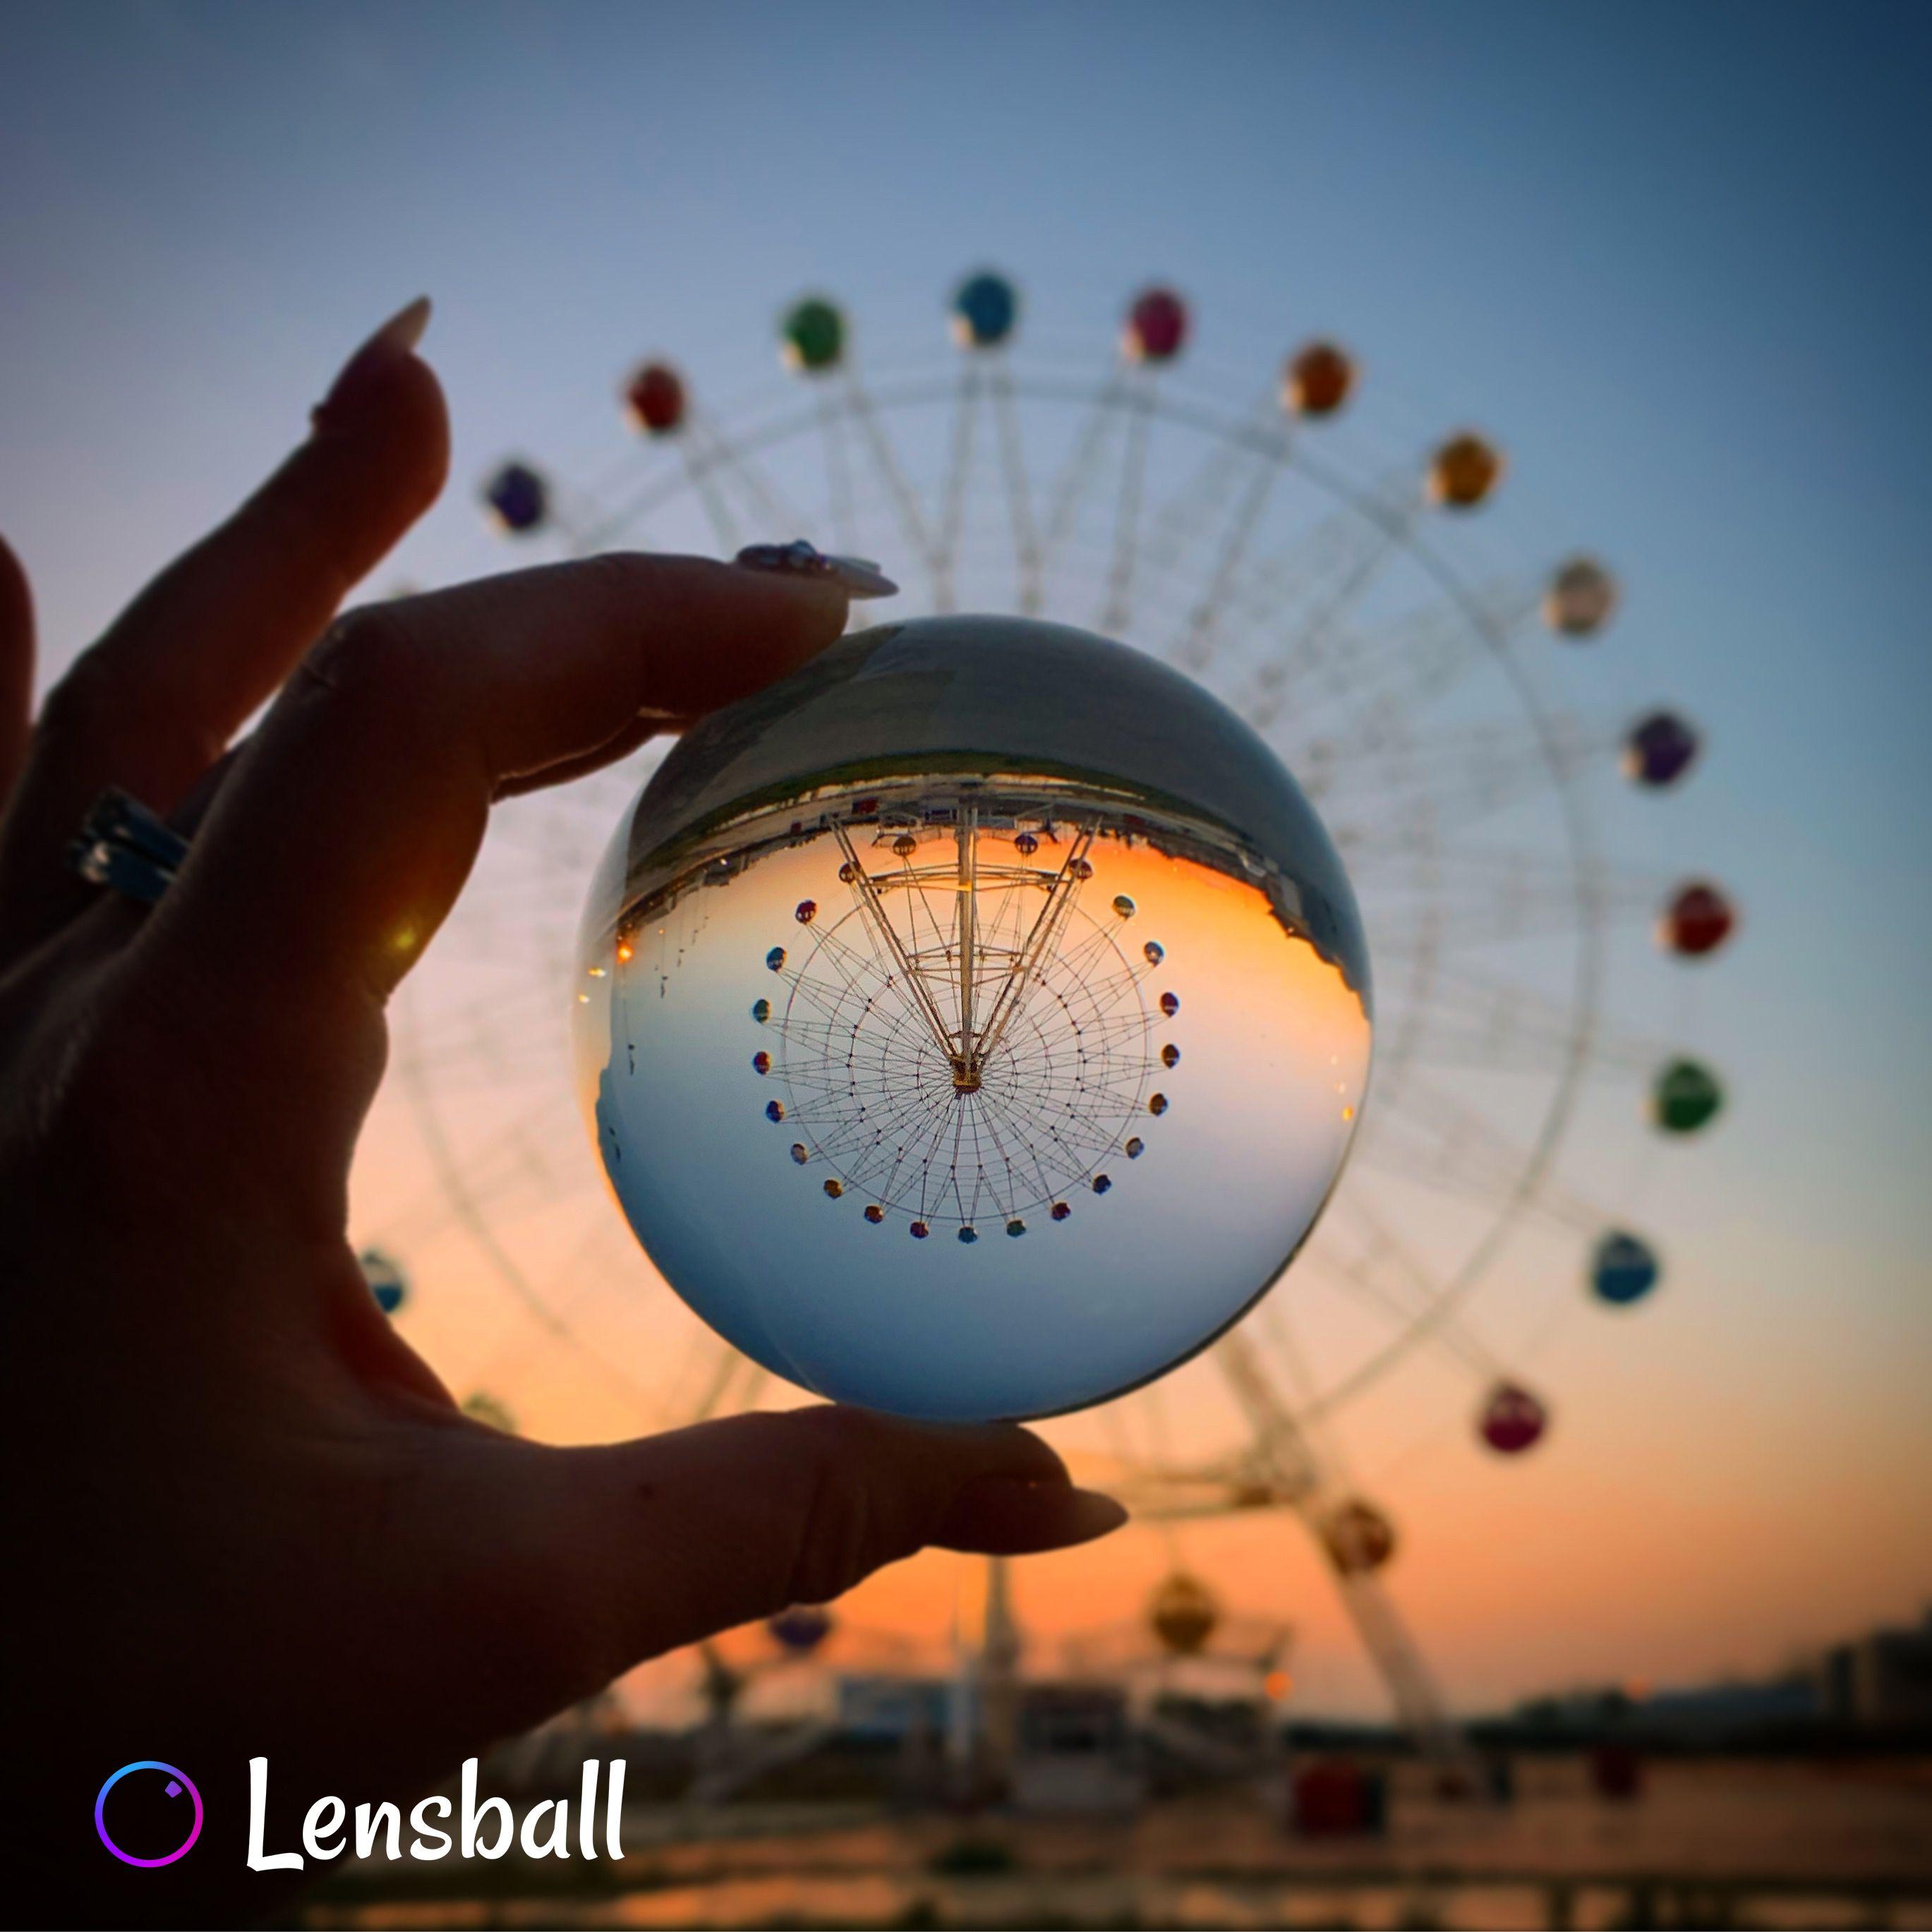 Original Lensball Pro Magical Photography Crystal Photography Reflection Photography